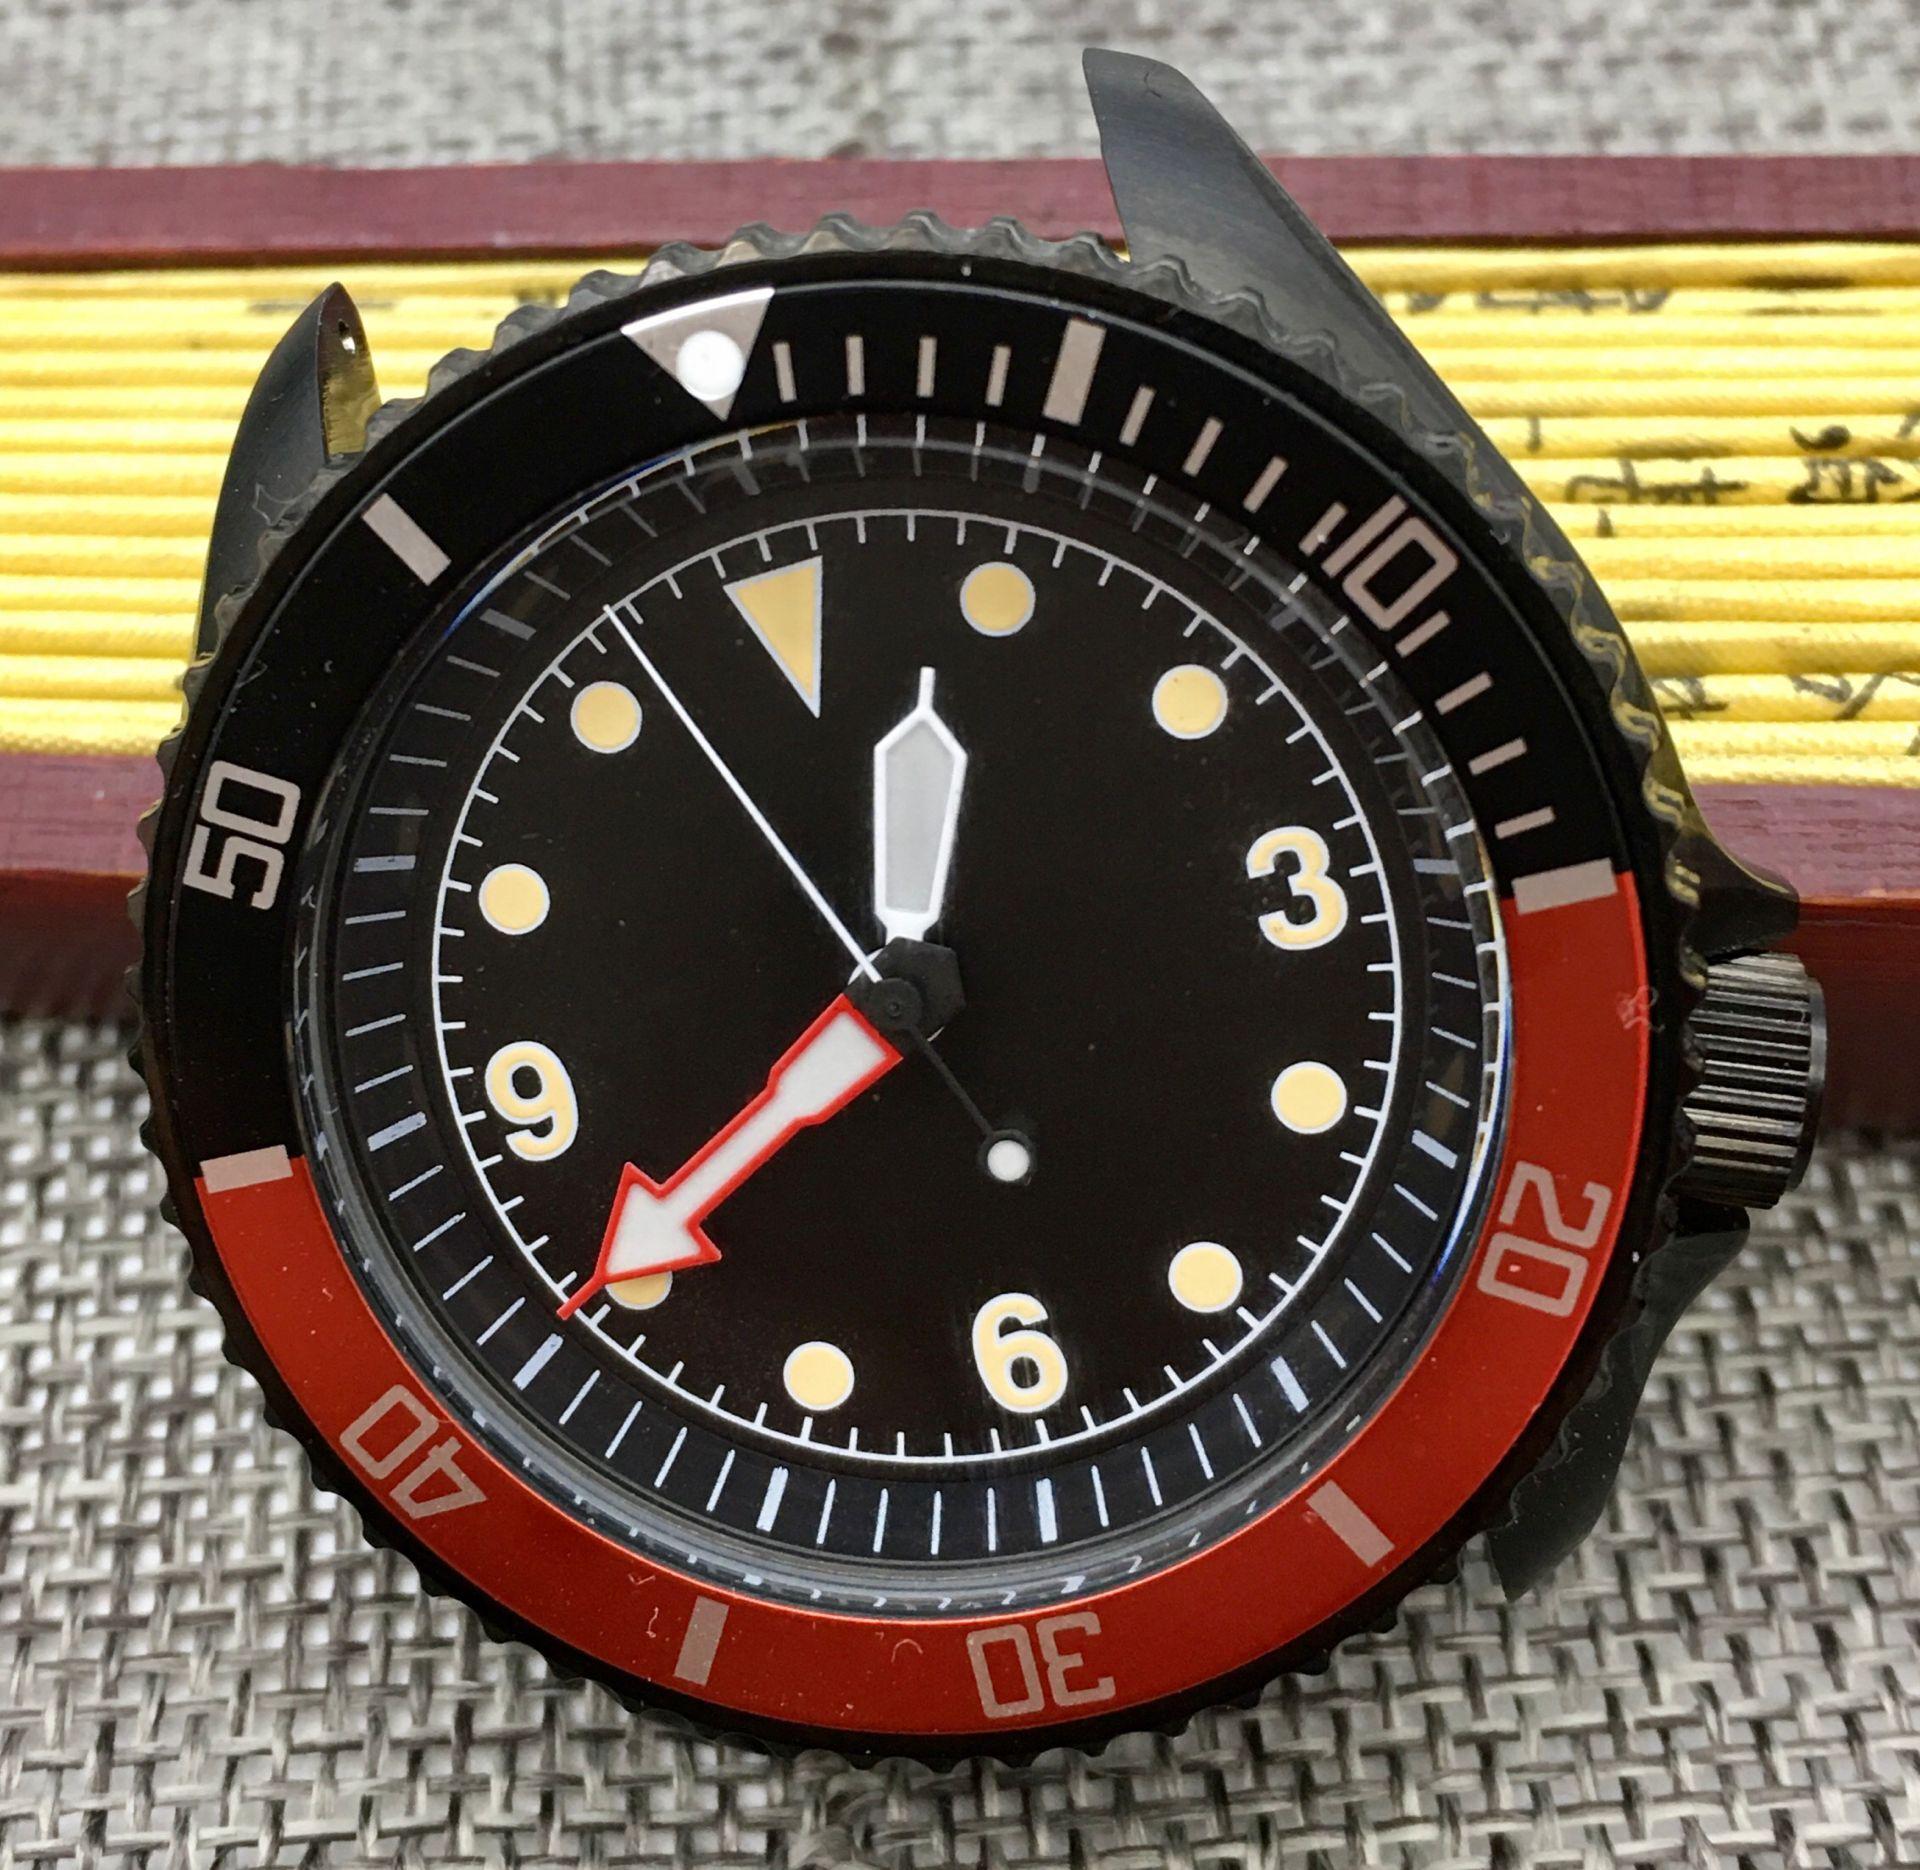 Retro 42mm Black PVD Case Luminous Dial Japanese Movement NH35 Automatic Men's Watch SK007 Mechanical